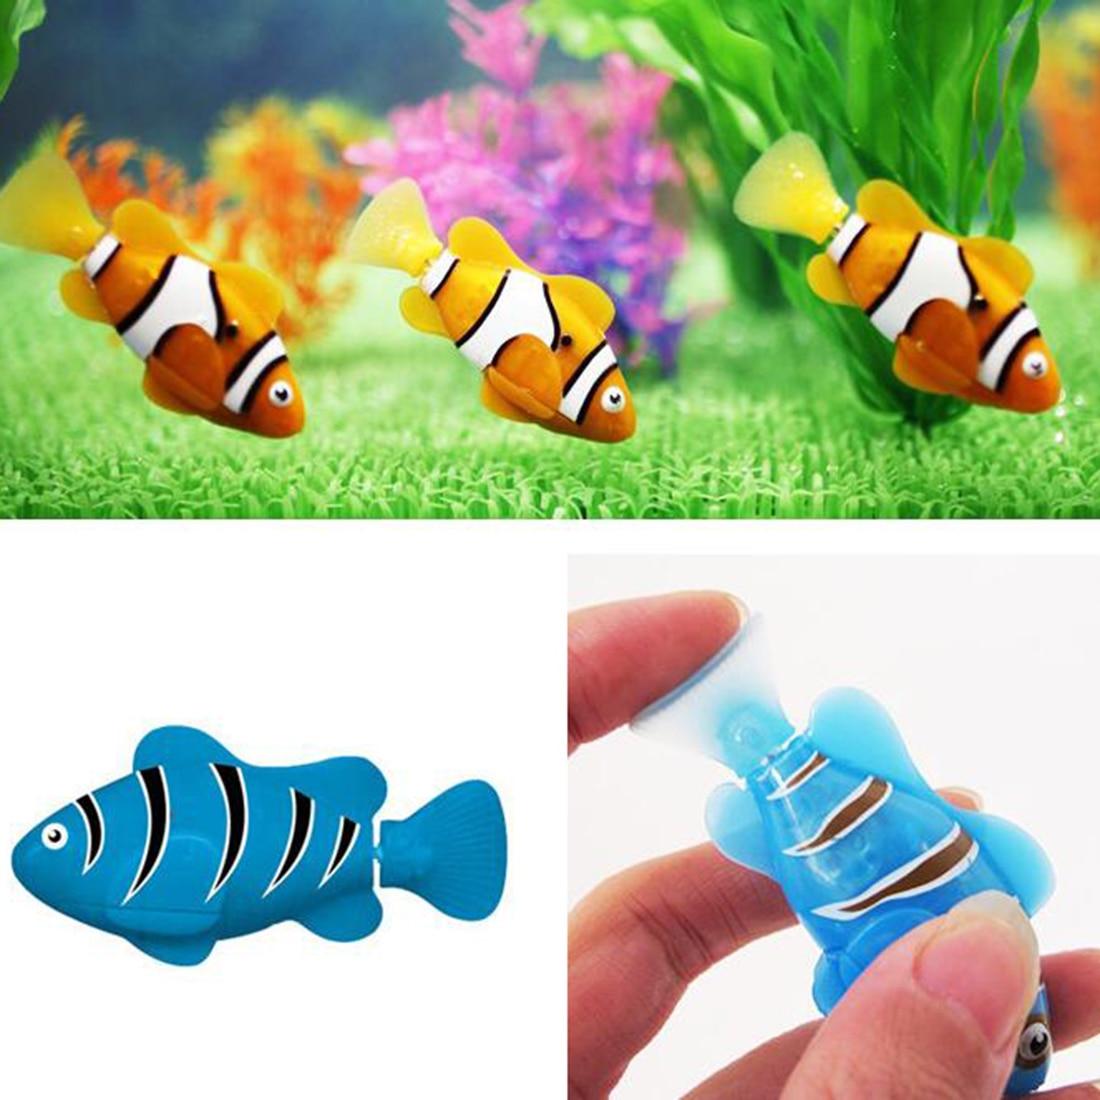 2016 robofish activated battery powered robo fish toy fish for Robo fish tank